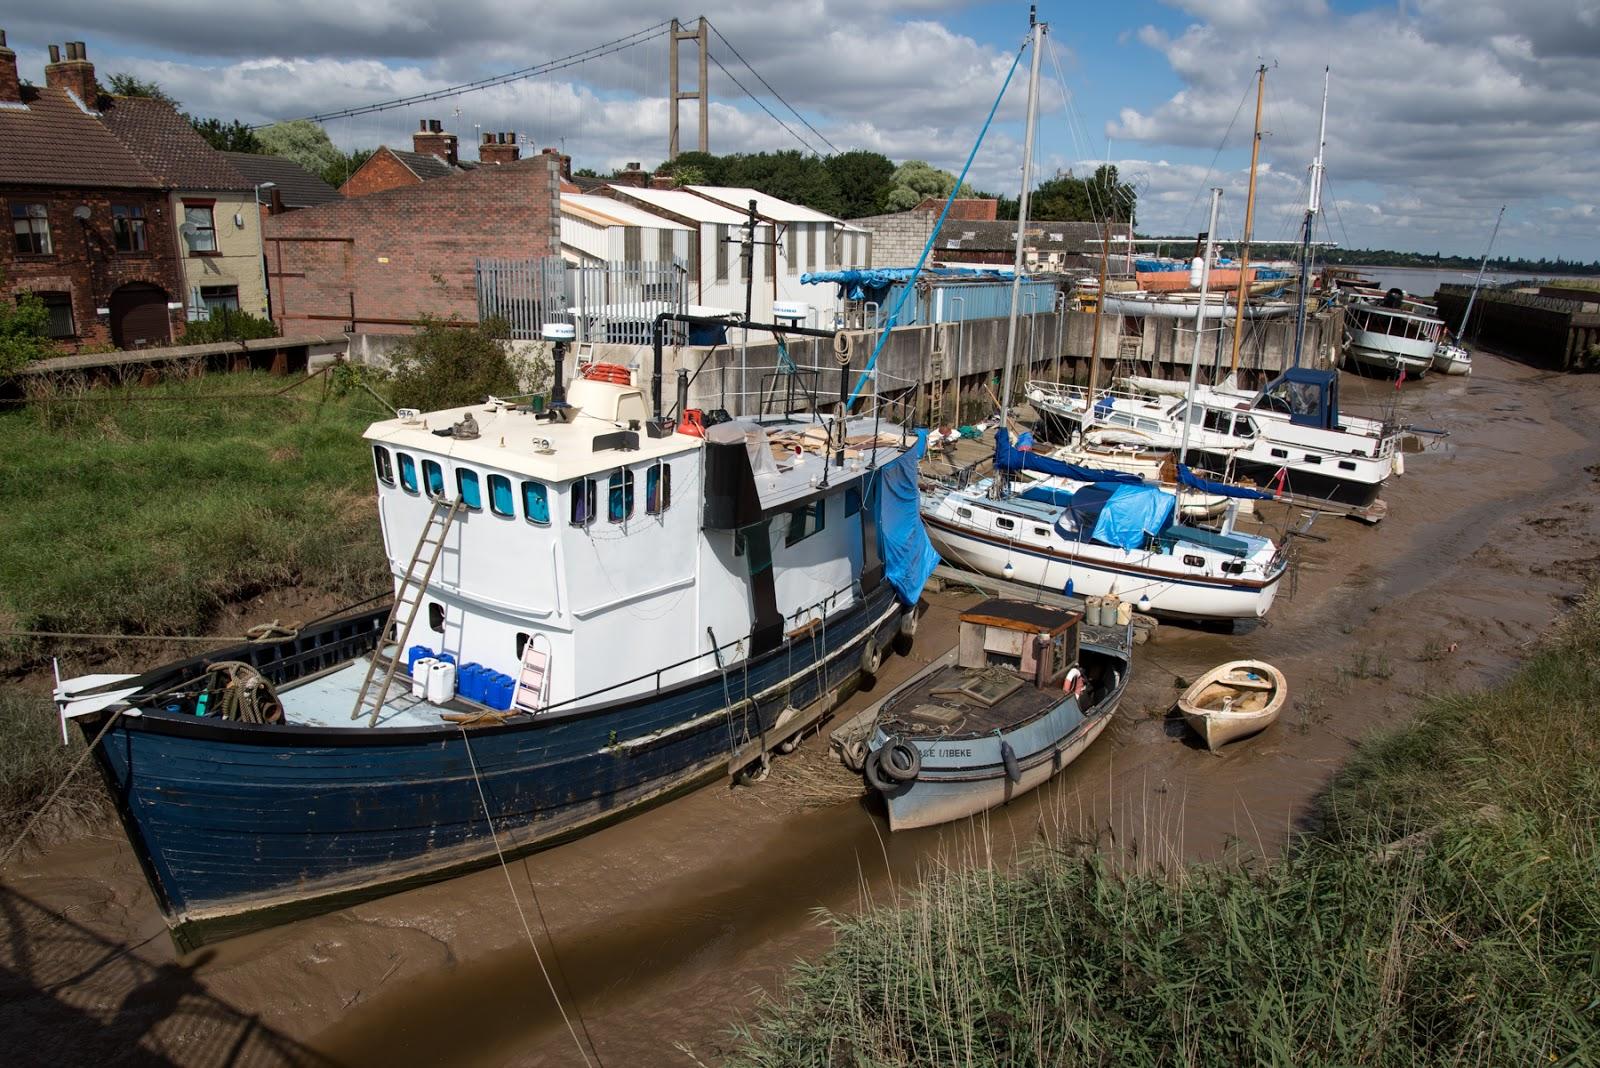 Barton boat yar